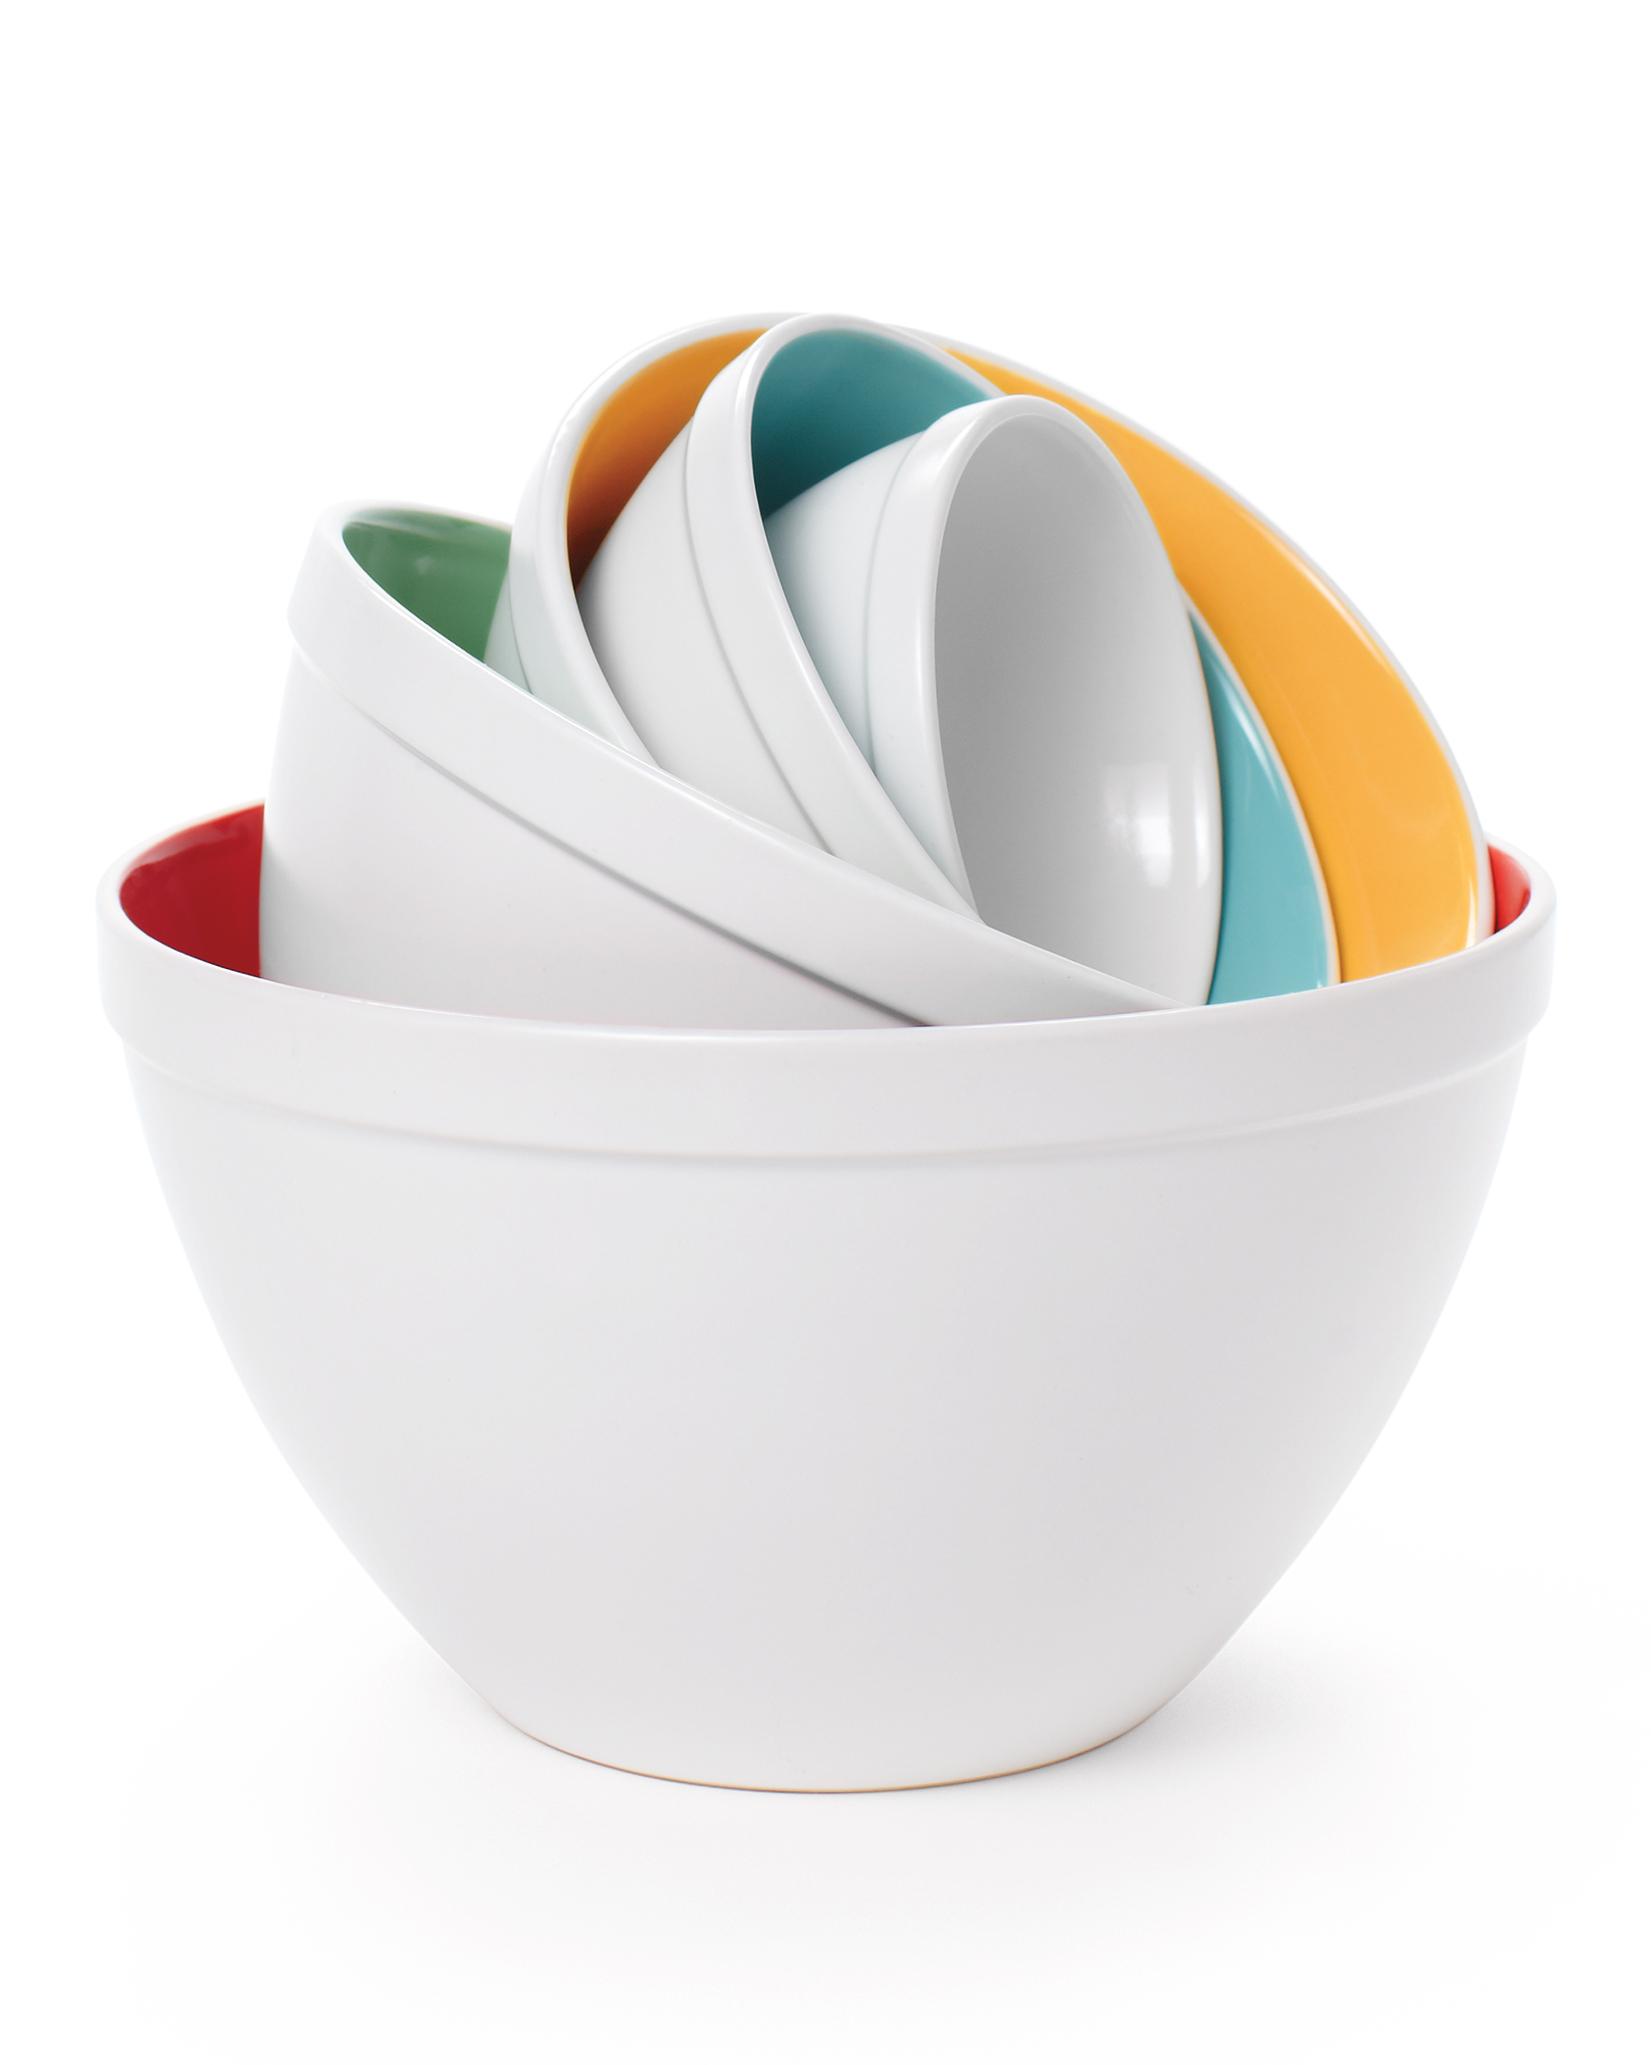 stacked-bowls-288-mwd110609.jpg